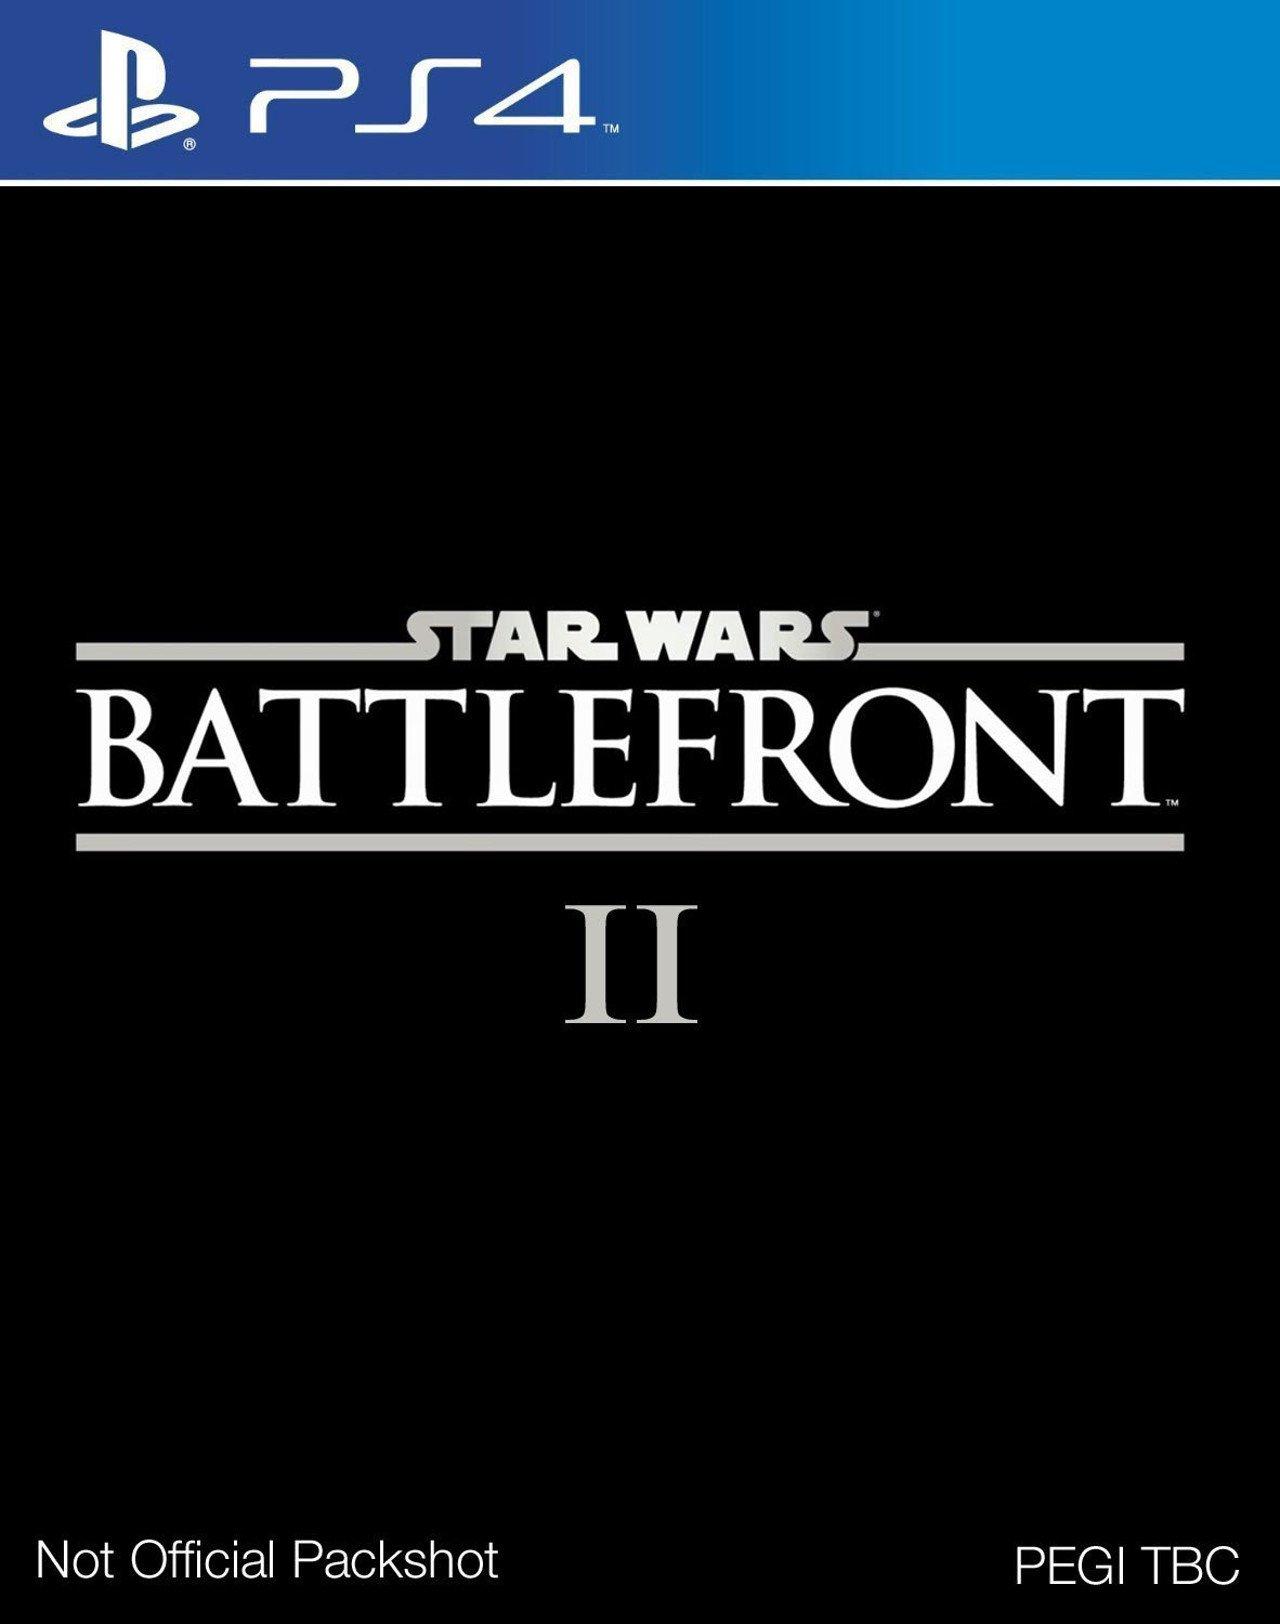 Star Wars Battlefront 2 compare su Amazon UK